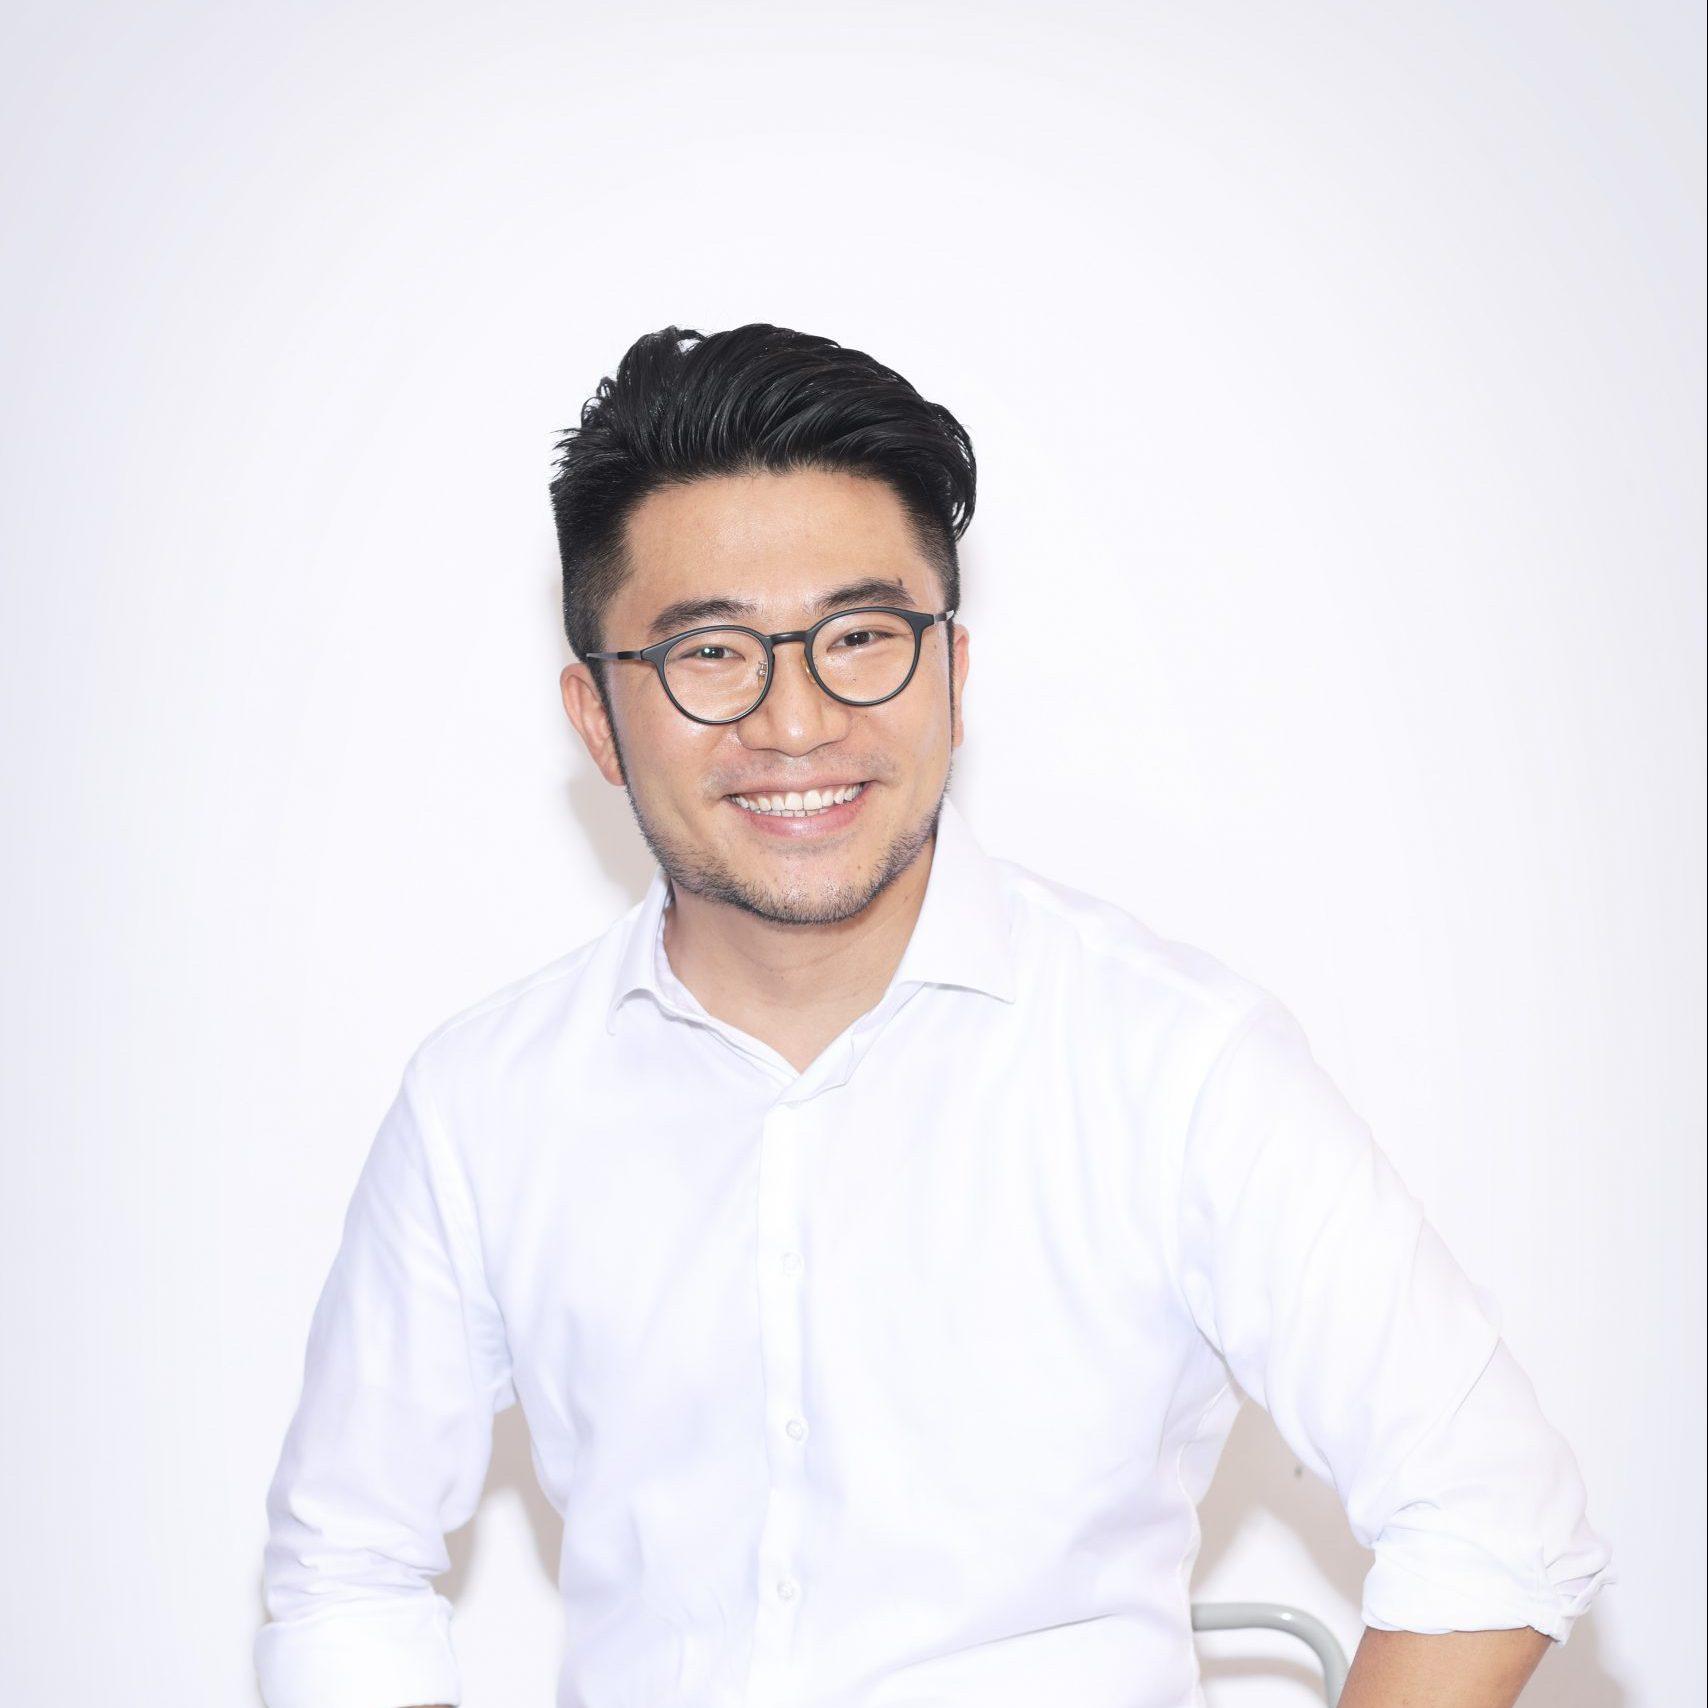 Timoteo Hung